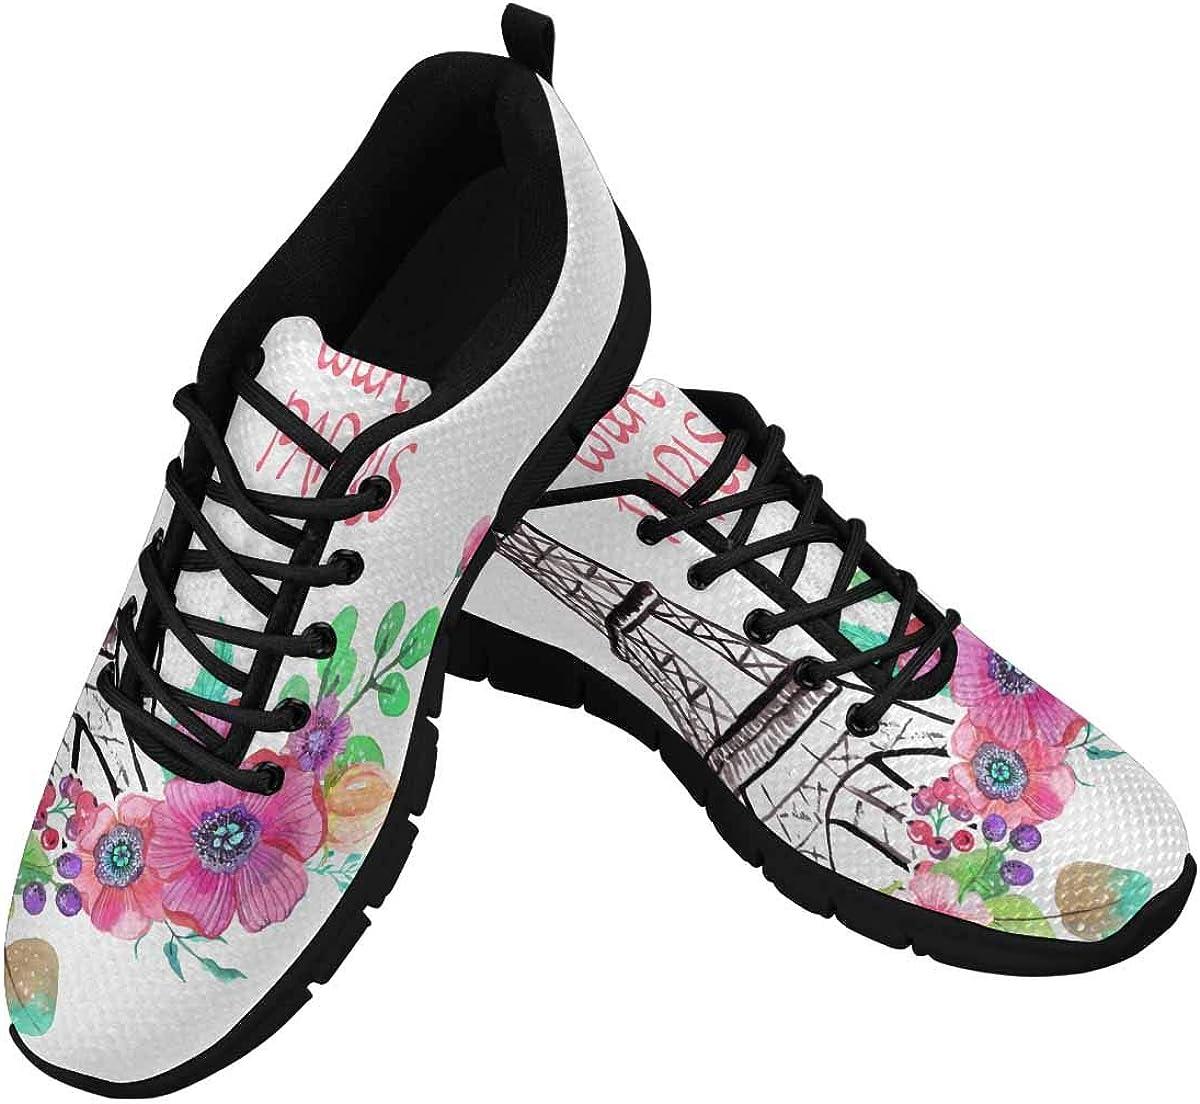 INTERESTPRINT Eiffel Tower Flowers Love Paris Women's Athletic Mesh Breathable Casual Sneakers